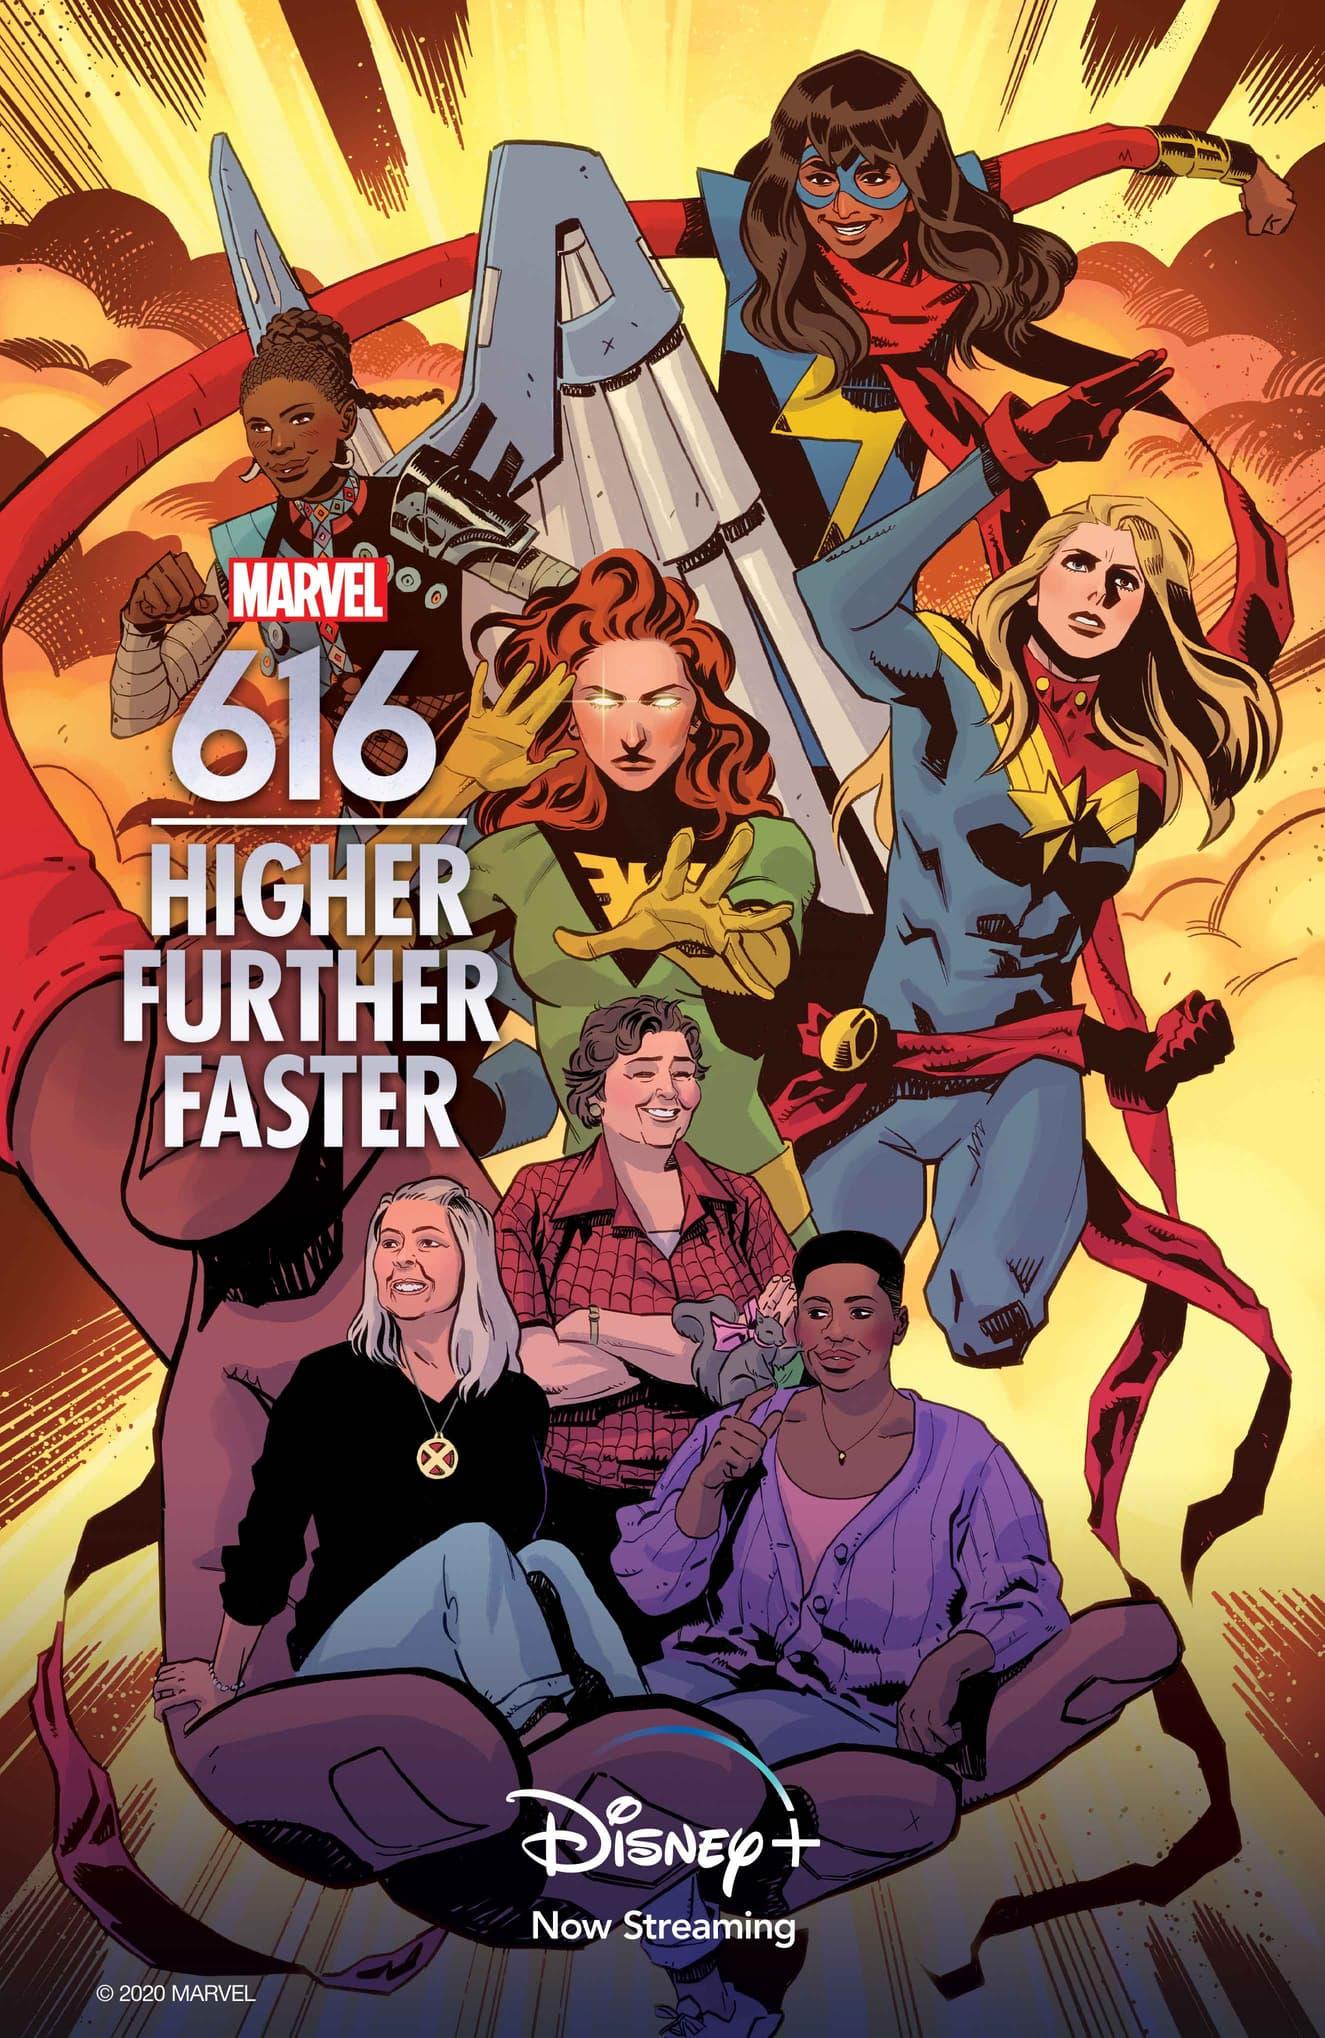 Marvel's 616 Higher Further Faster